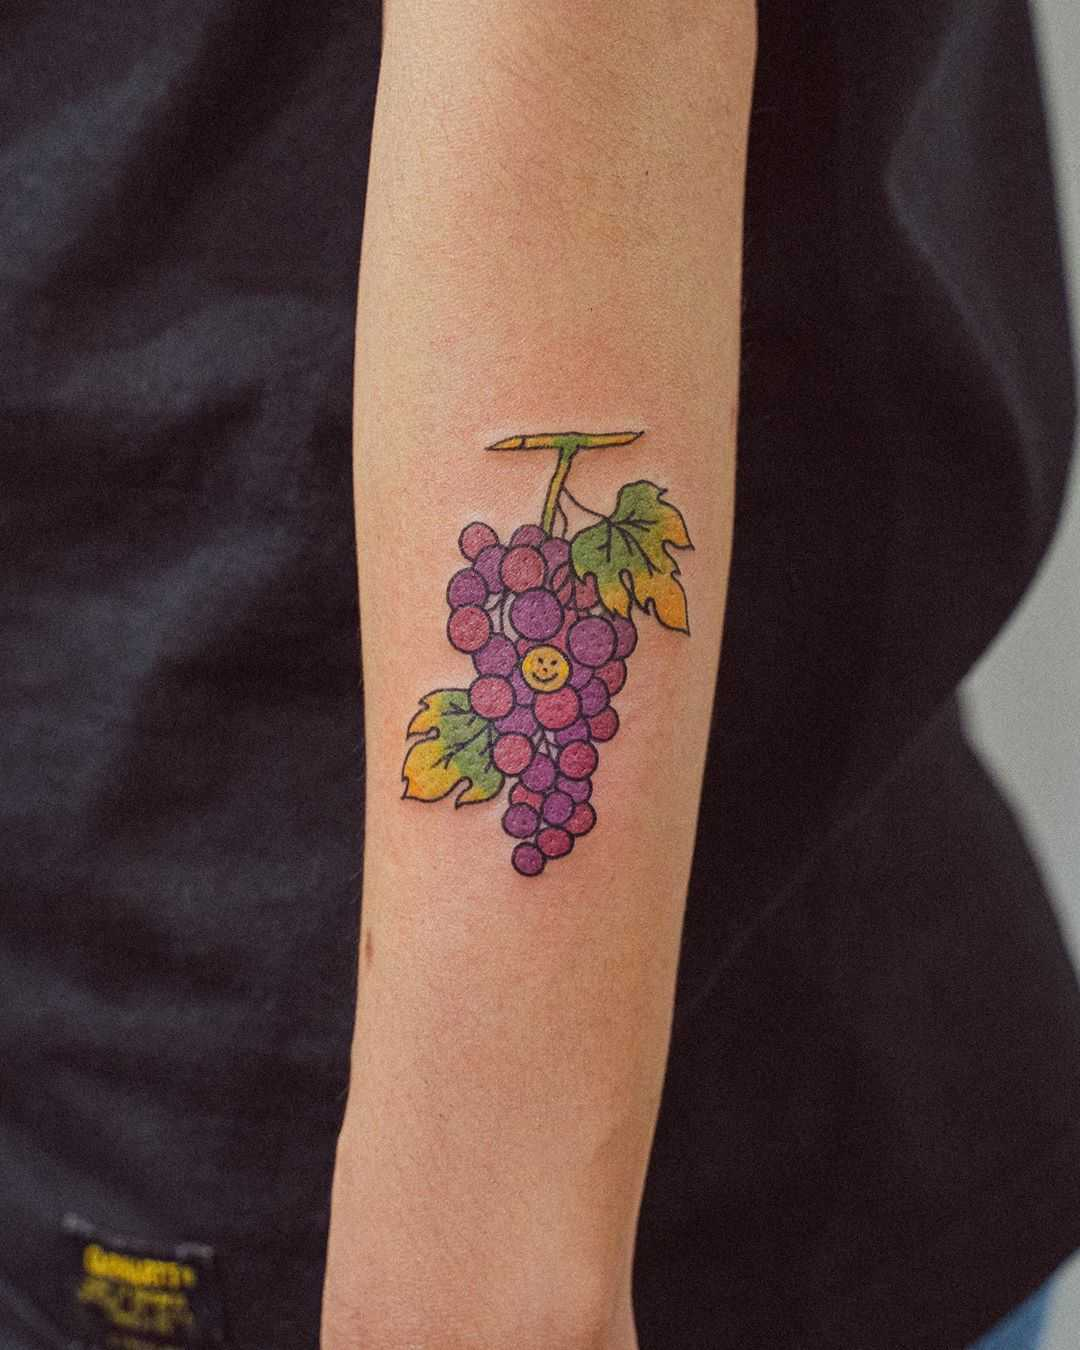 Grape branch tattoo by tattooist Bongkee